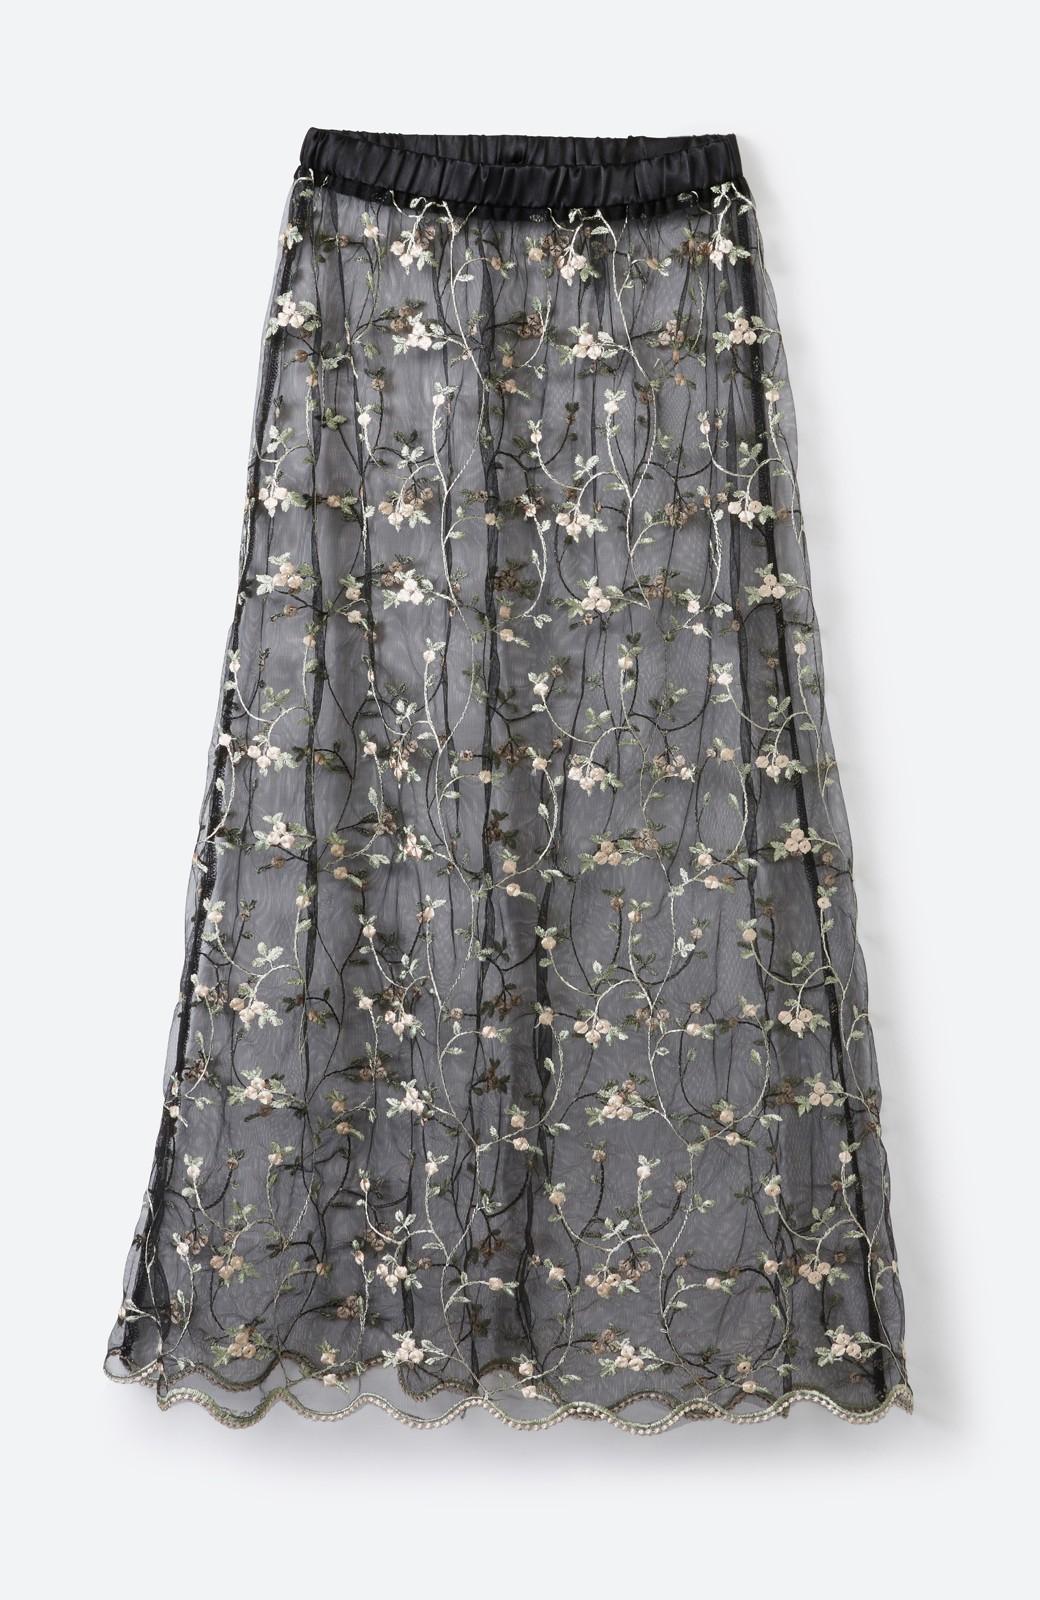 haco! <スザンヌさんコラボ>ラブ&ピースプロジェクト ニットワンピ&チュール刺しゅうスカートセット <パープル系その他>の商品写真5